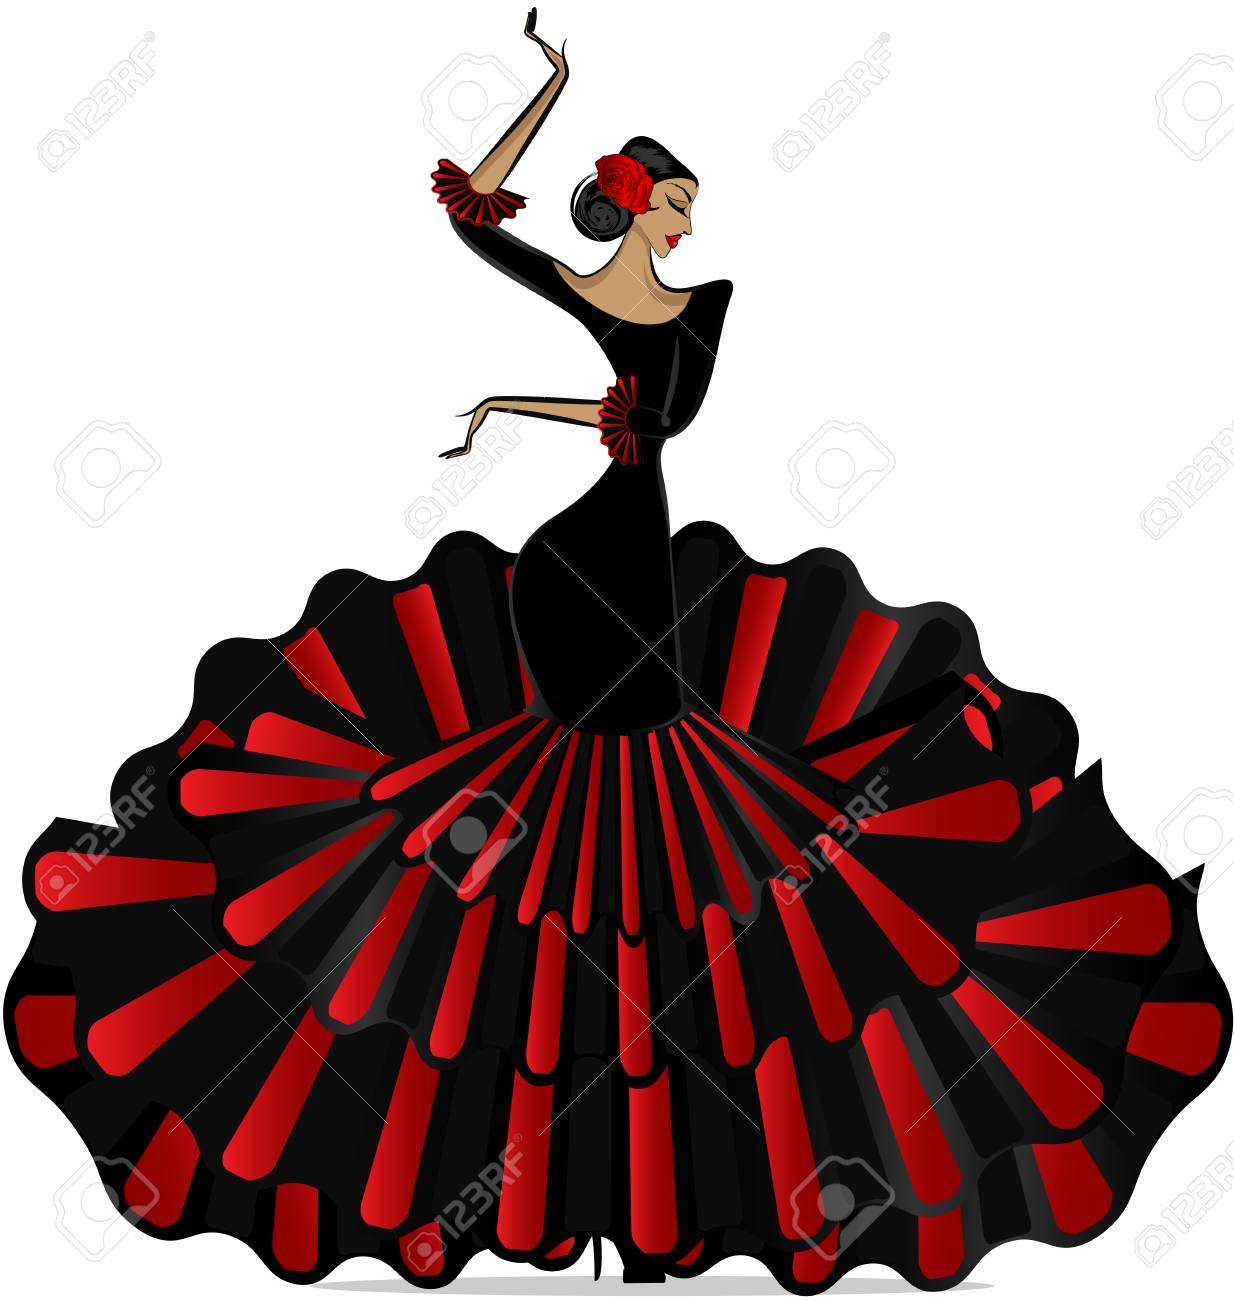 e4666e4fa Abstract Flamenco Girl In Dance. Royalty Free Cliparts, Vectors, And ...